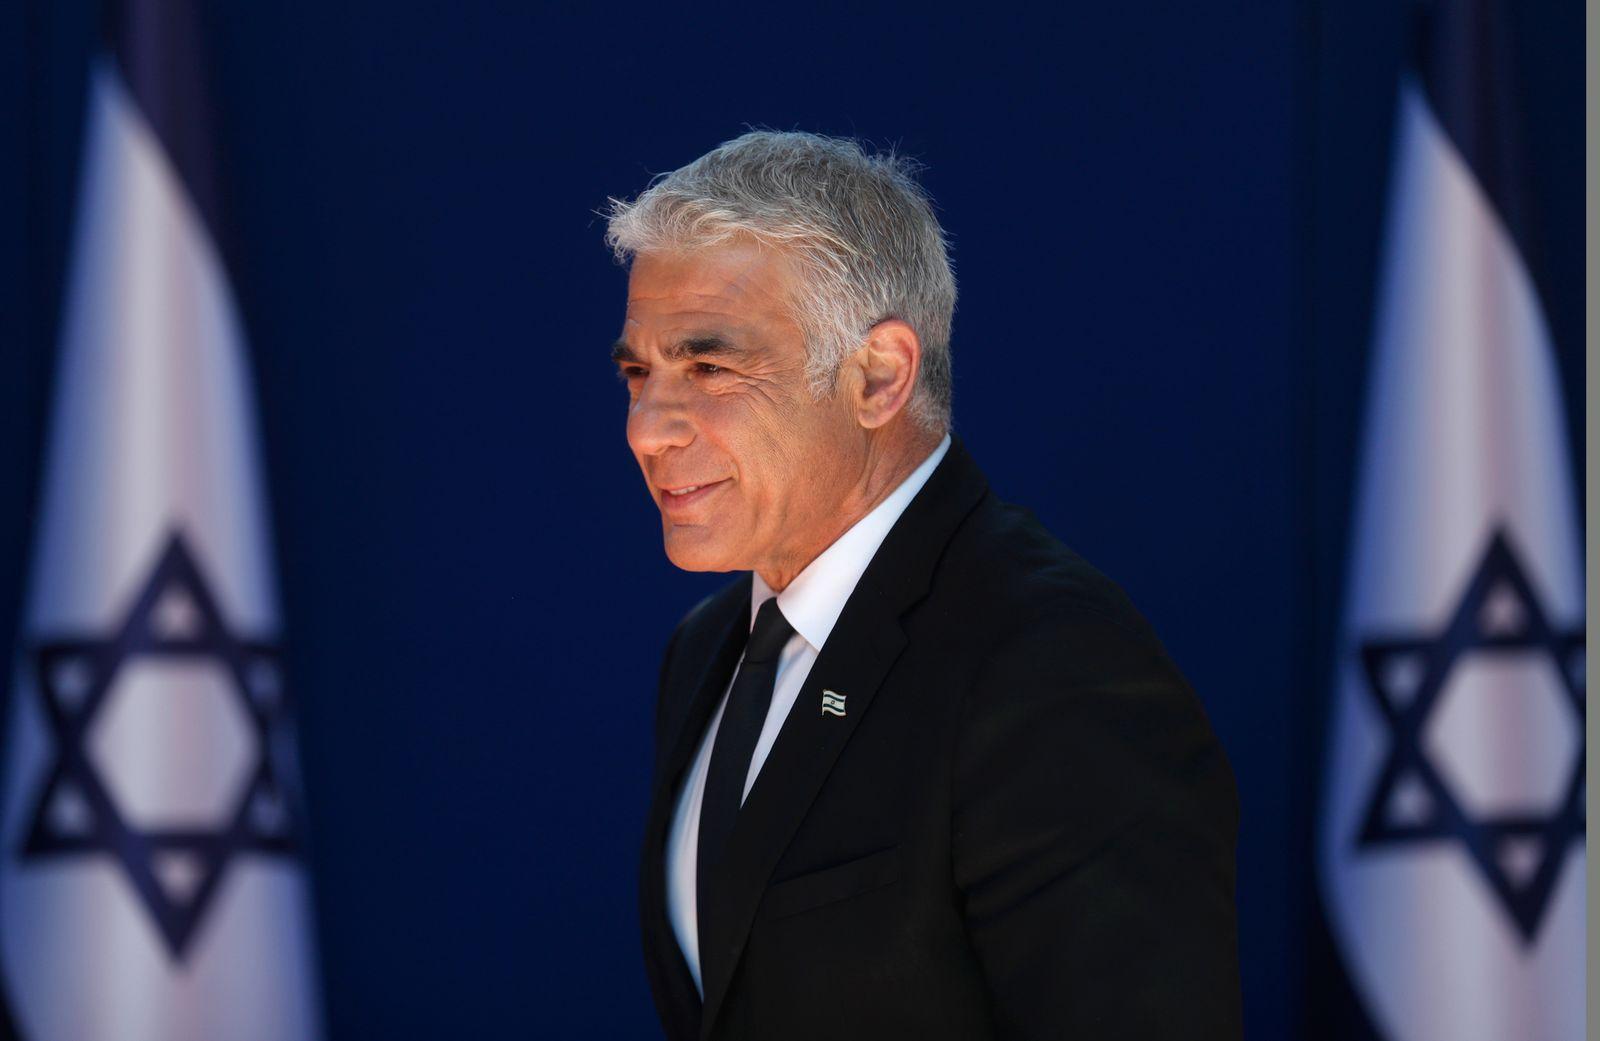 Israeli President receiving the new Israeli Government